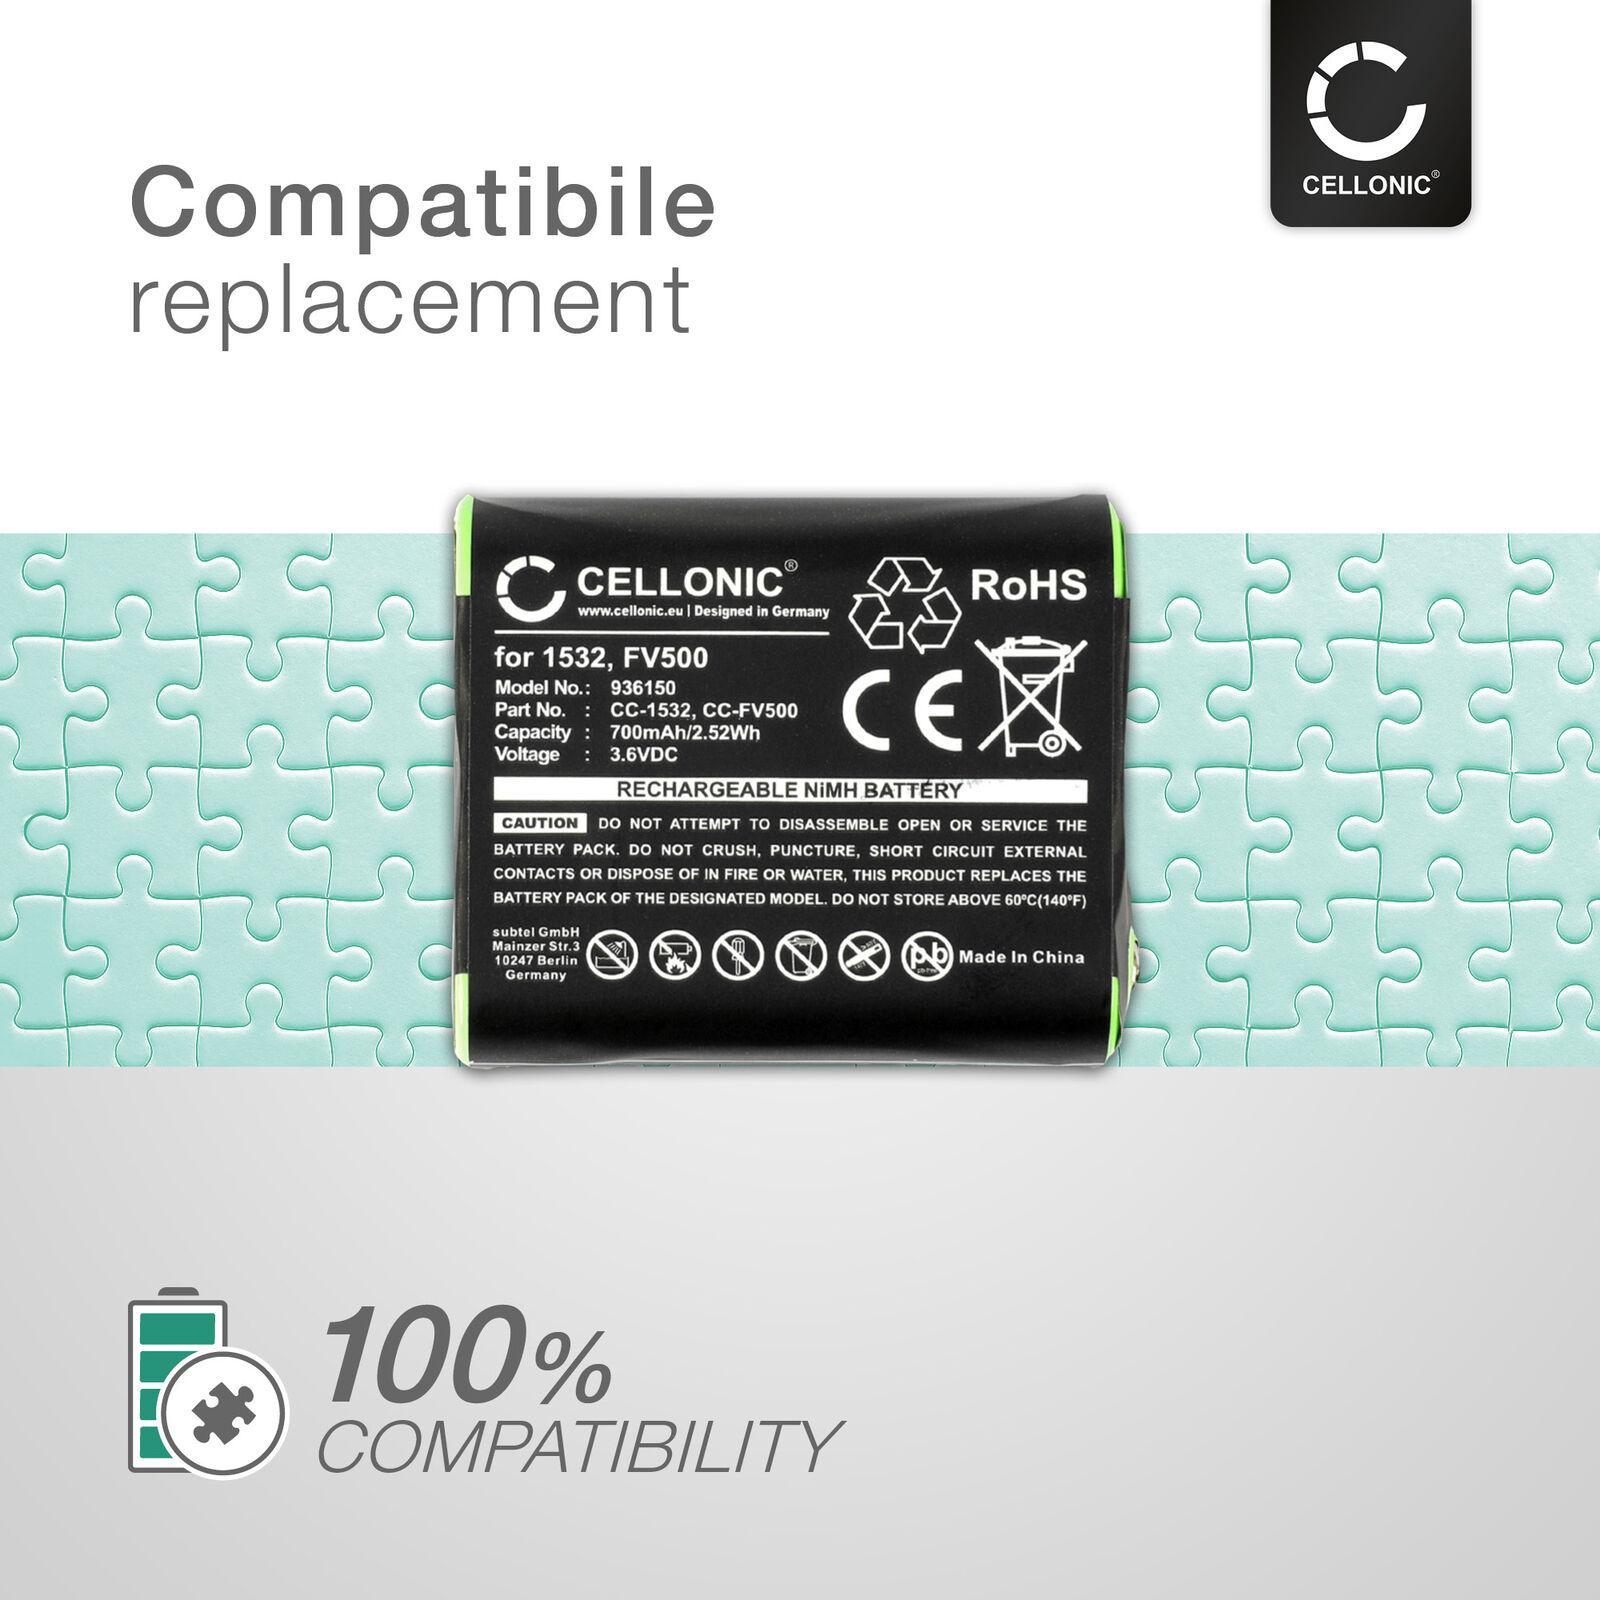 Batterie remplacement pour Motorola KEBT071B HKNN4002 PMNN4477AR 700mAh